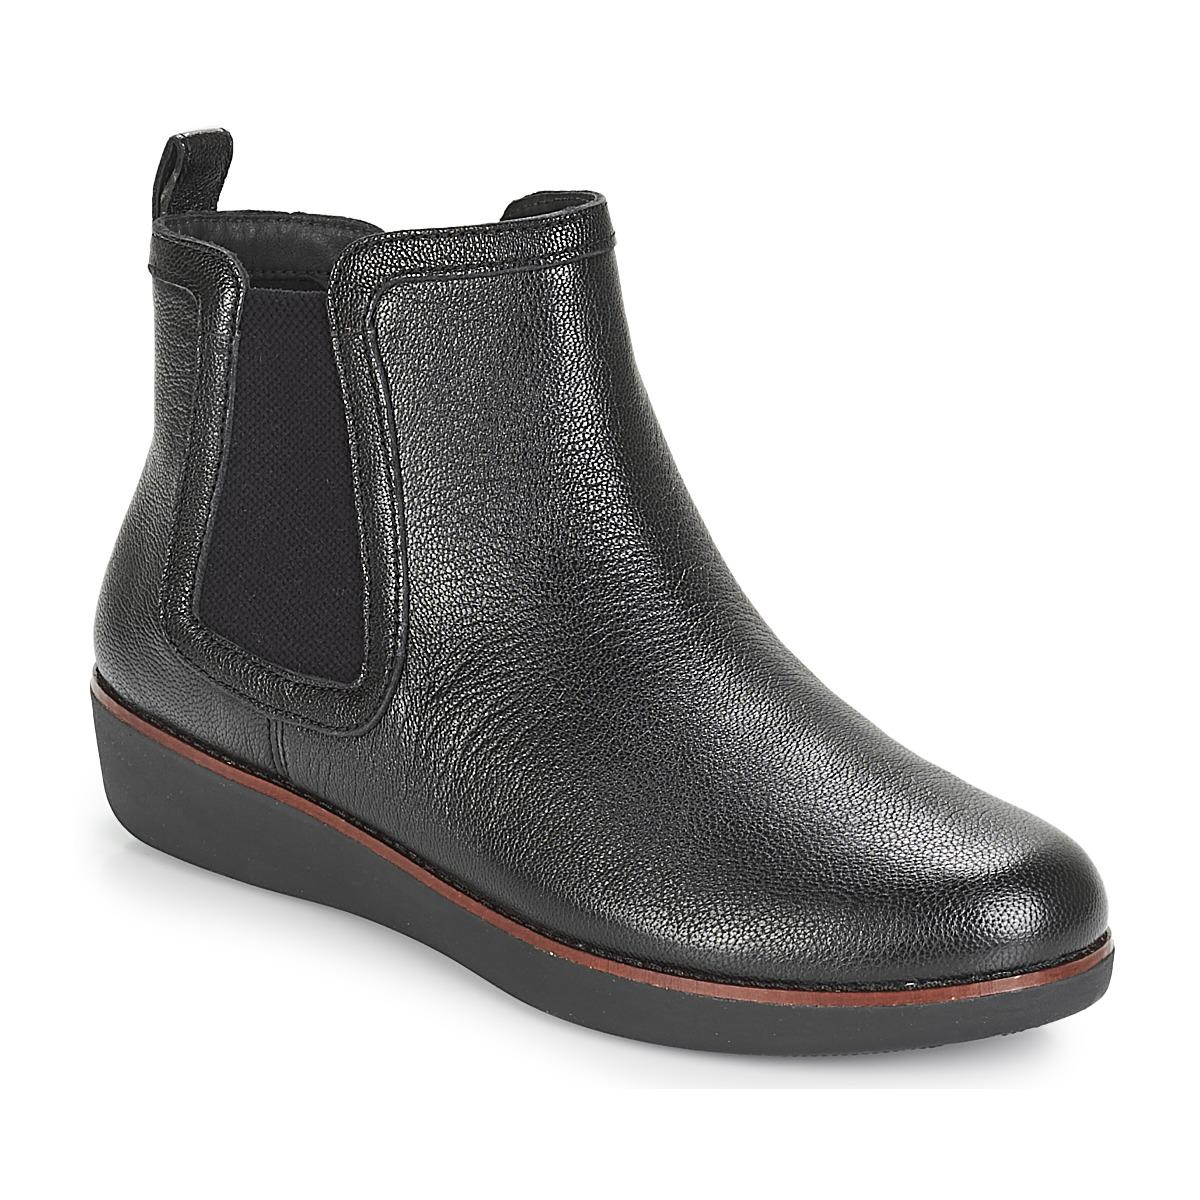 dd5c0a9e4fbf42 Fitflop Chai Women s Mid Boots In Black in Black - Lyst